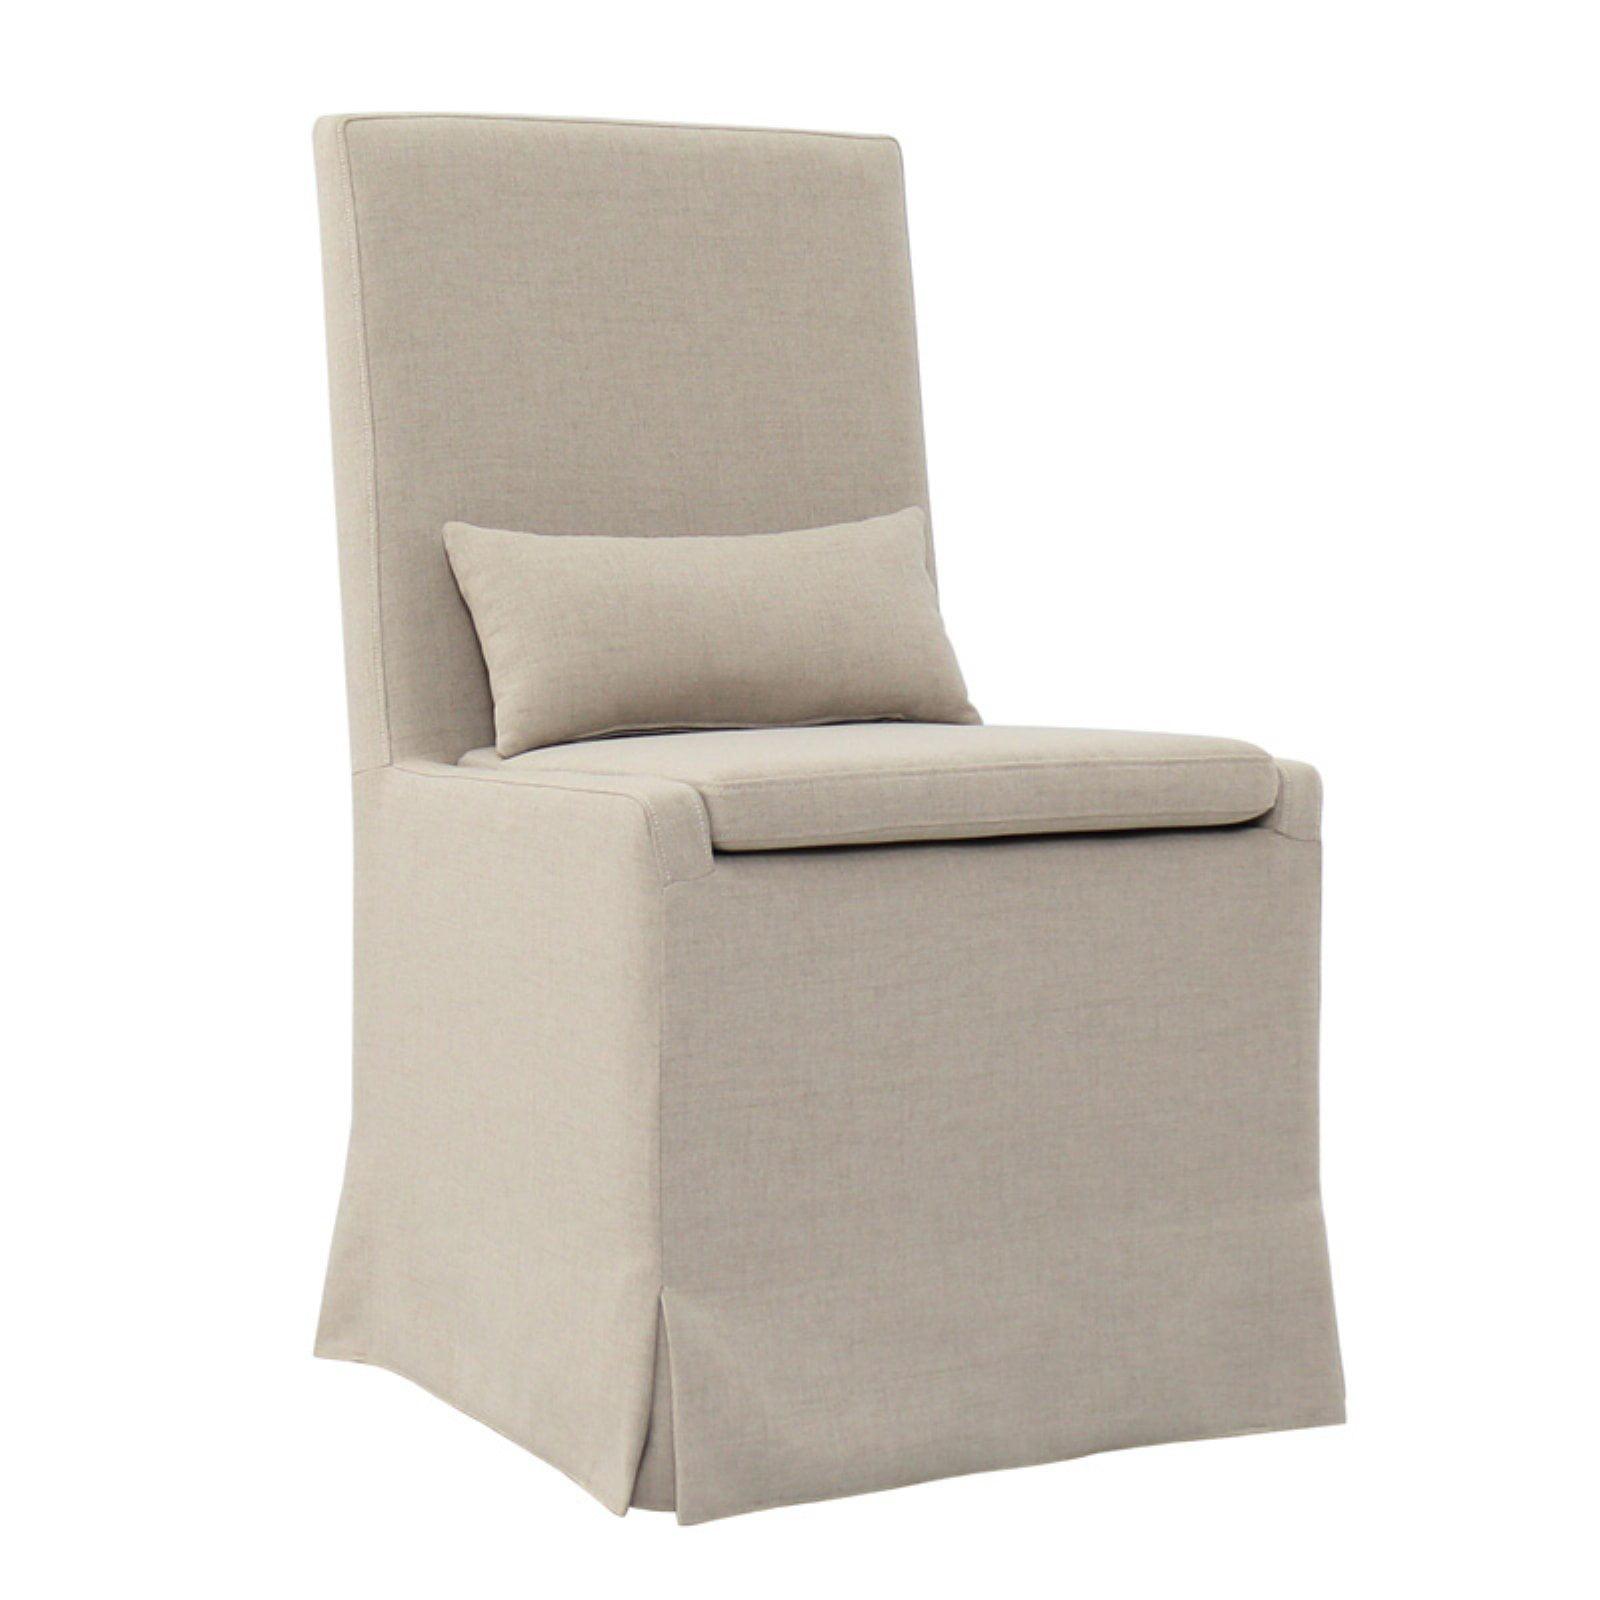 Padmas Plantation Sandspur Beach Dining Chair